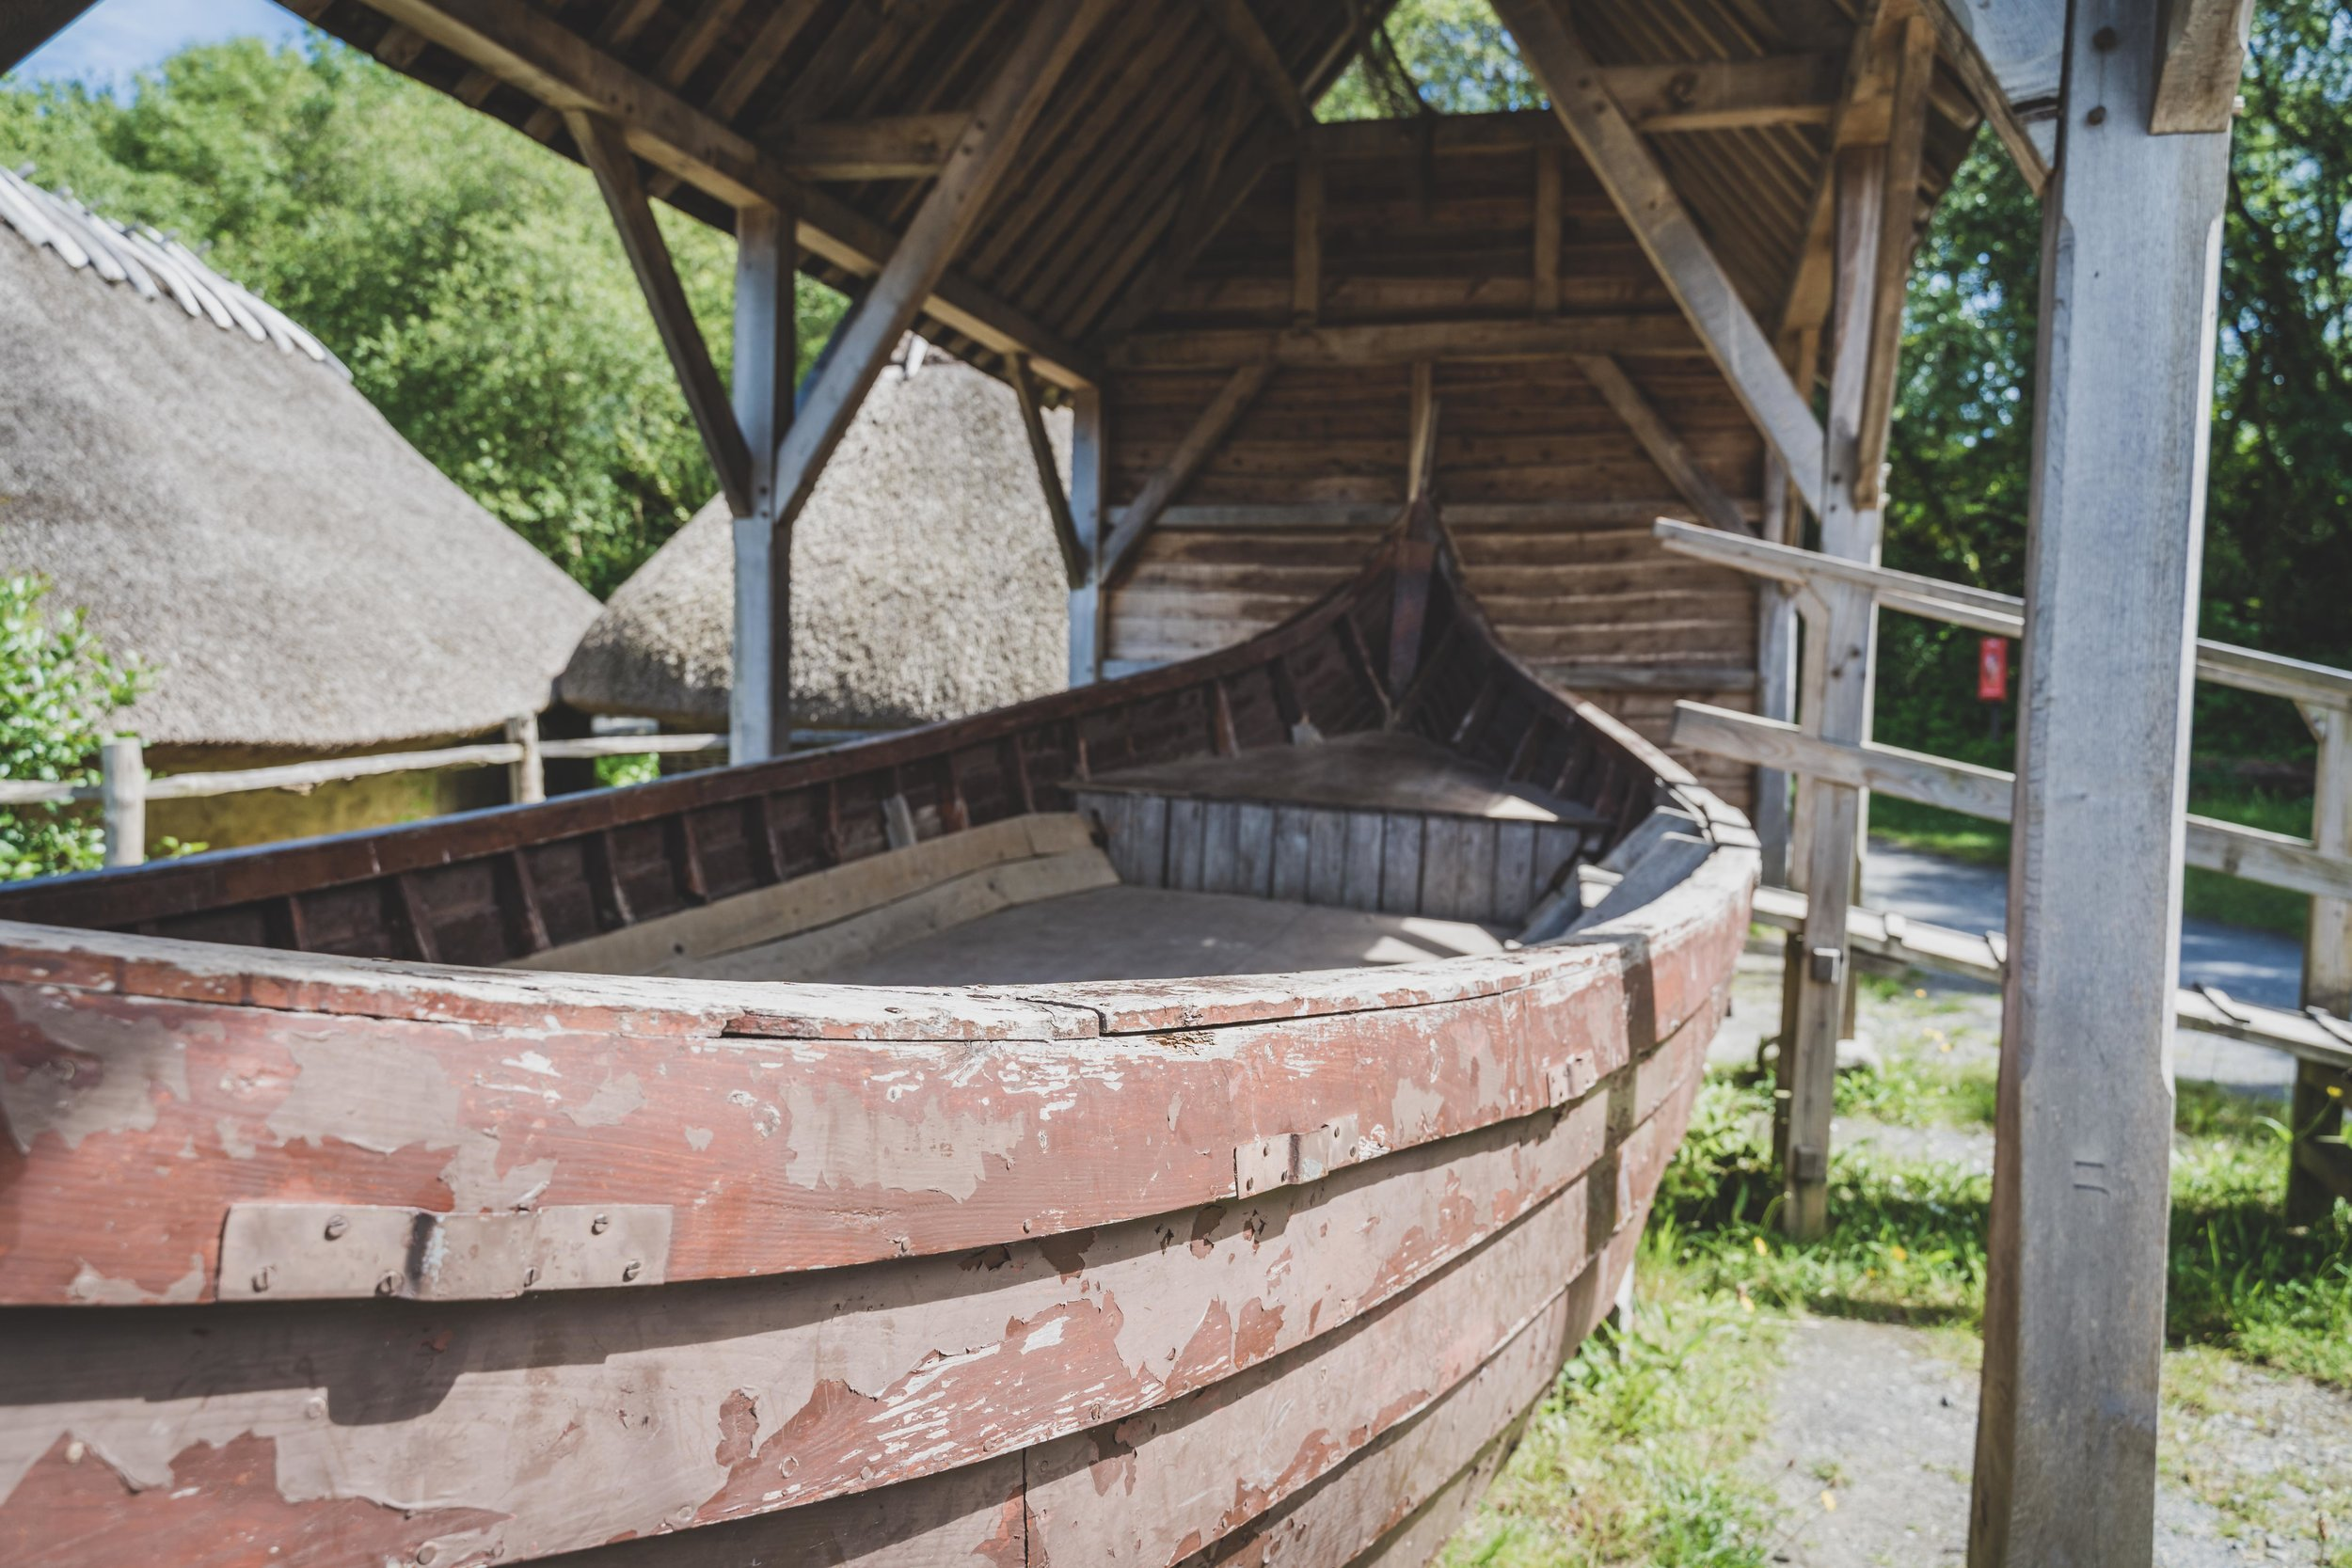 wexford heritage centre ireland viking ship.jpg